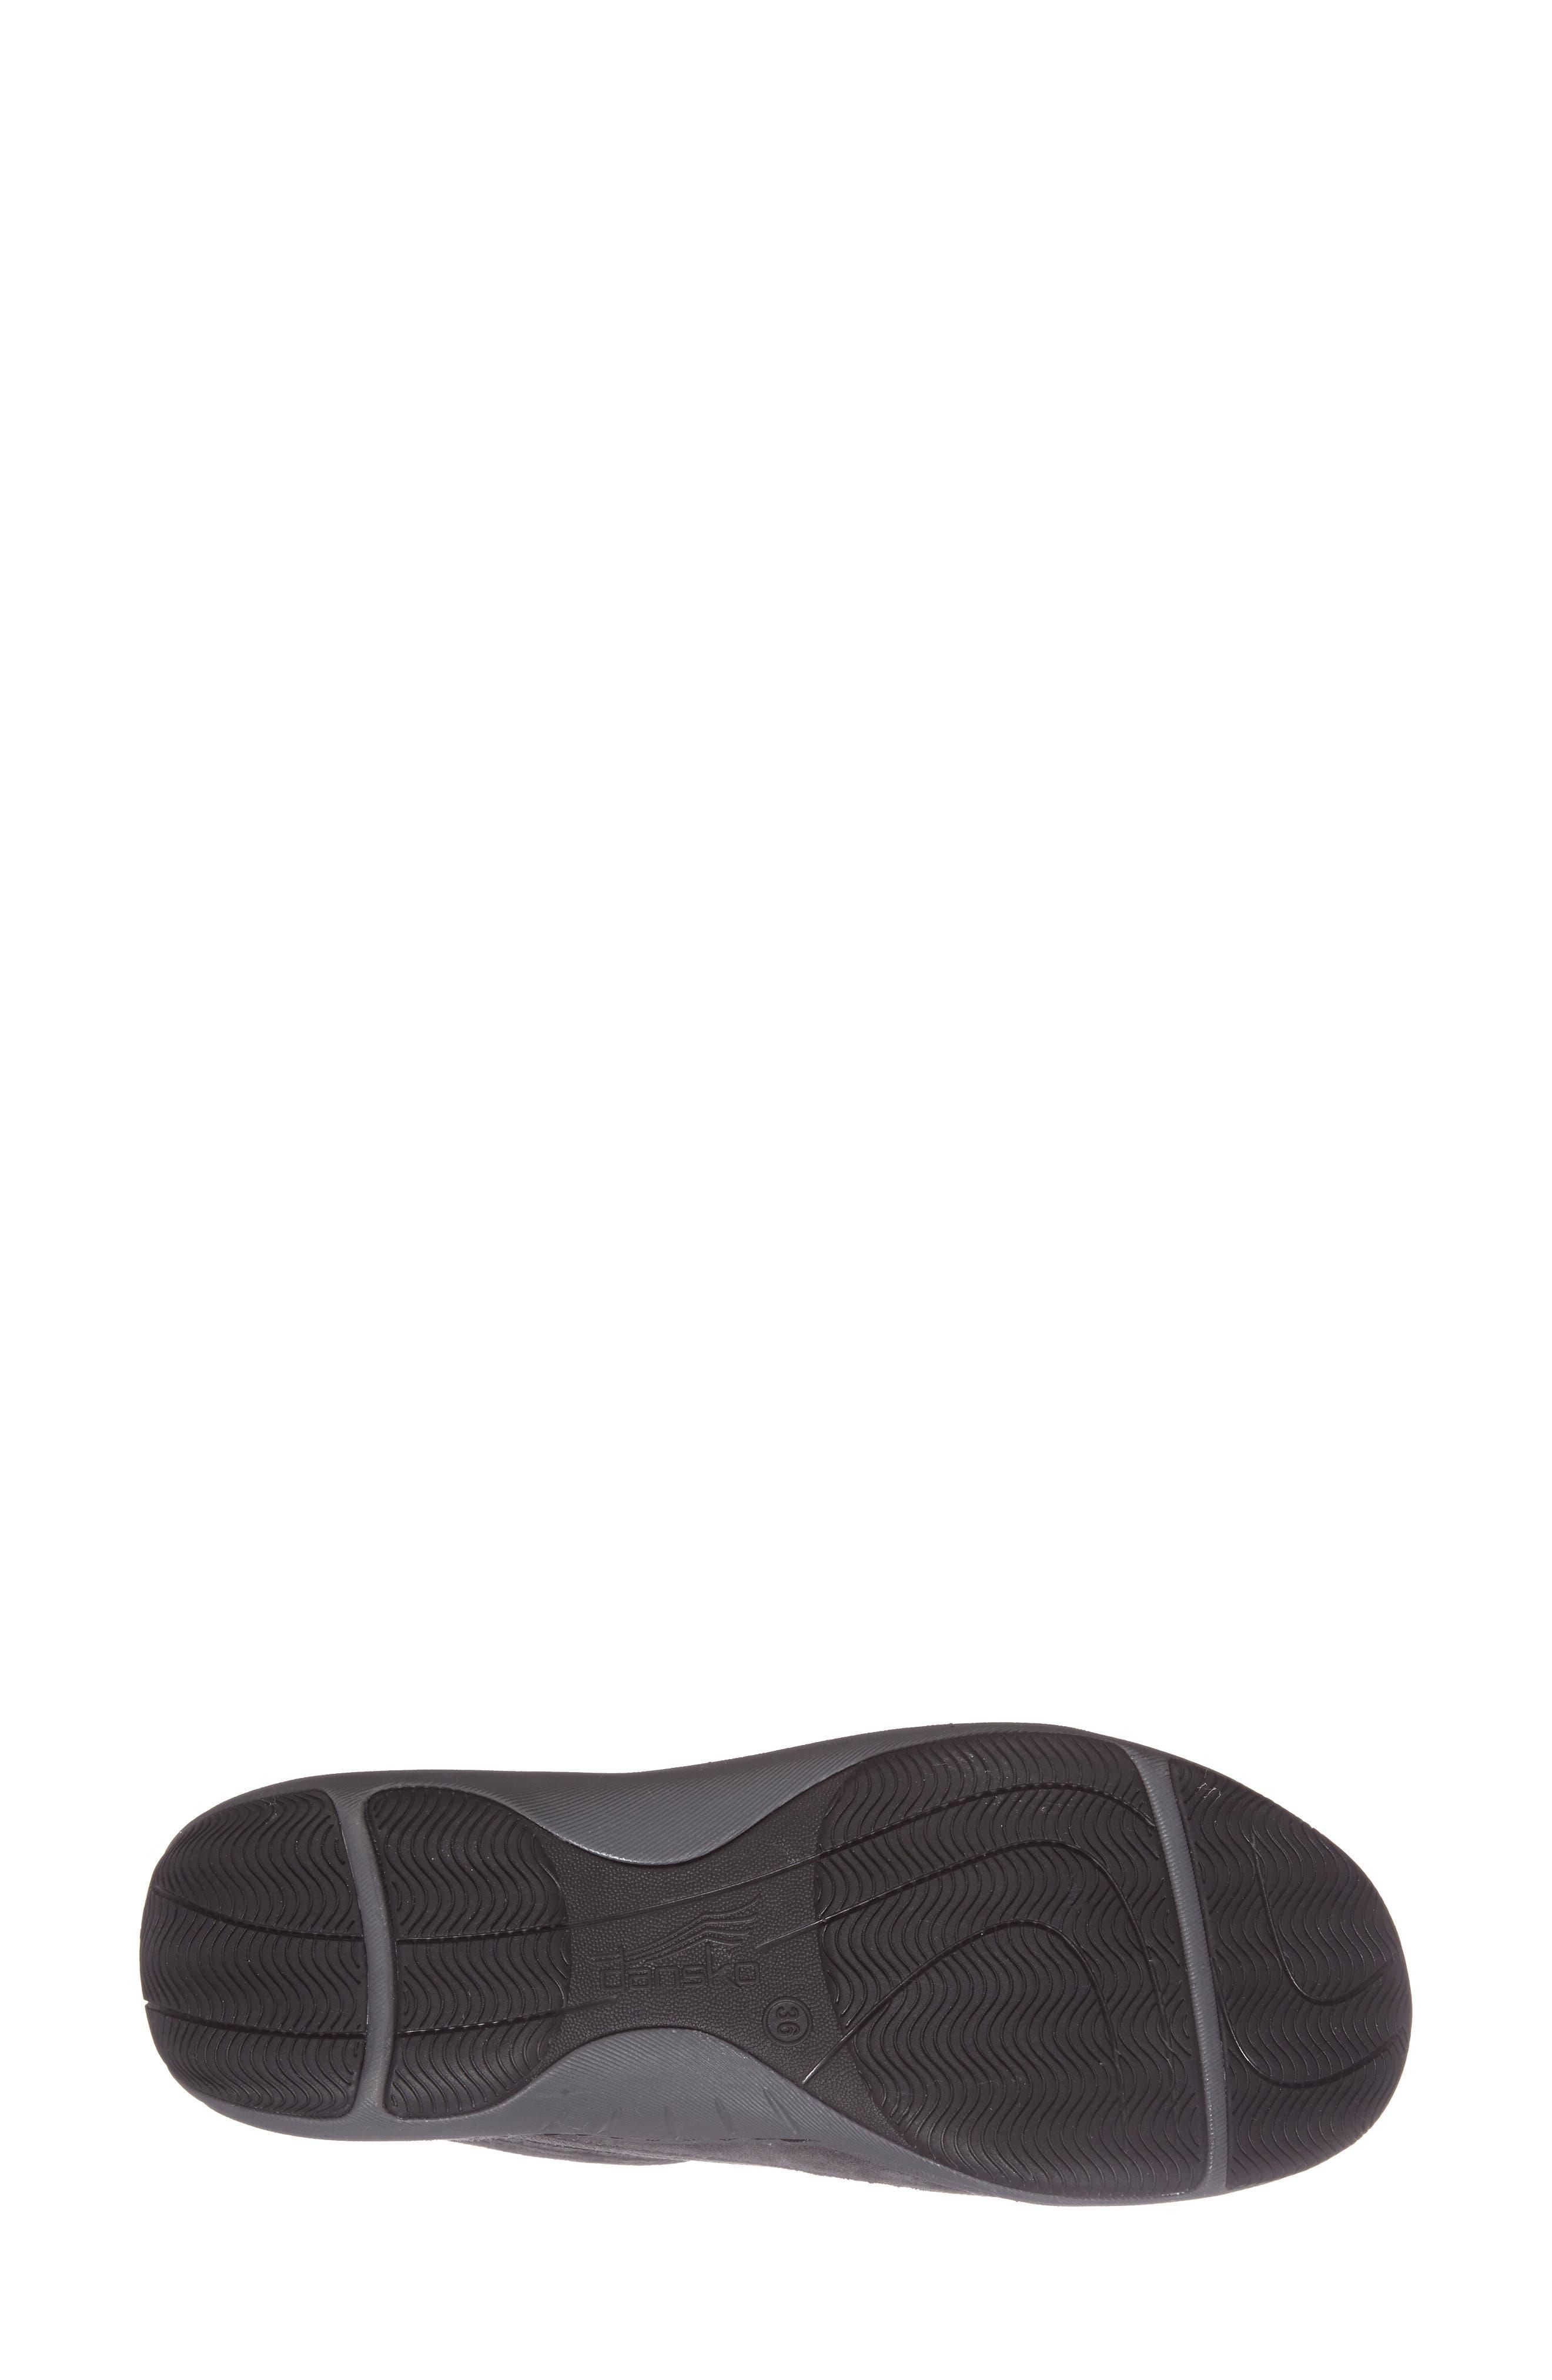 'Helen' Suede & Mesh Sneaker,                             Alternate thumbnail 66, color,